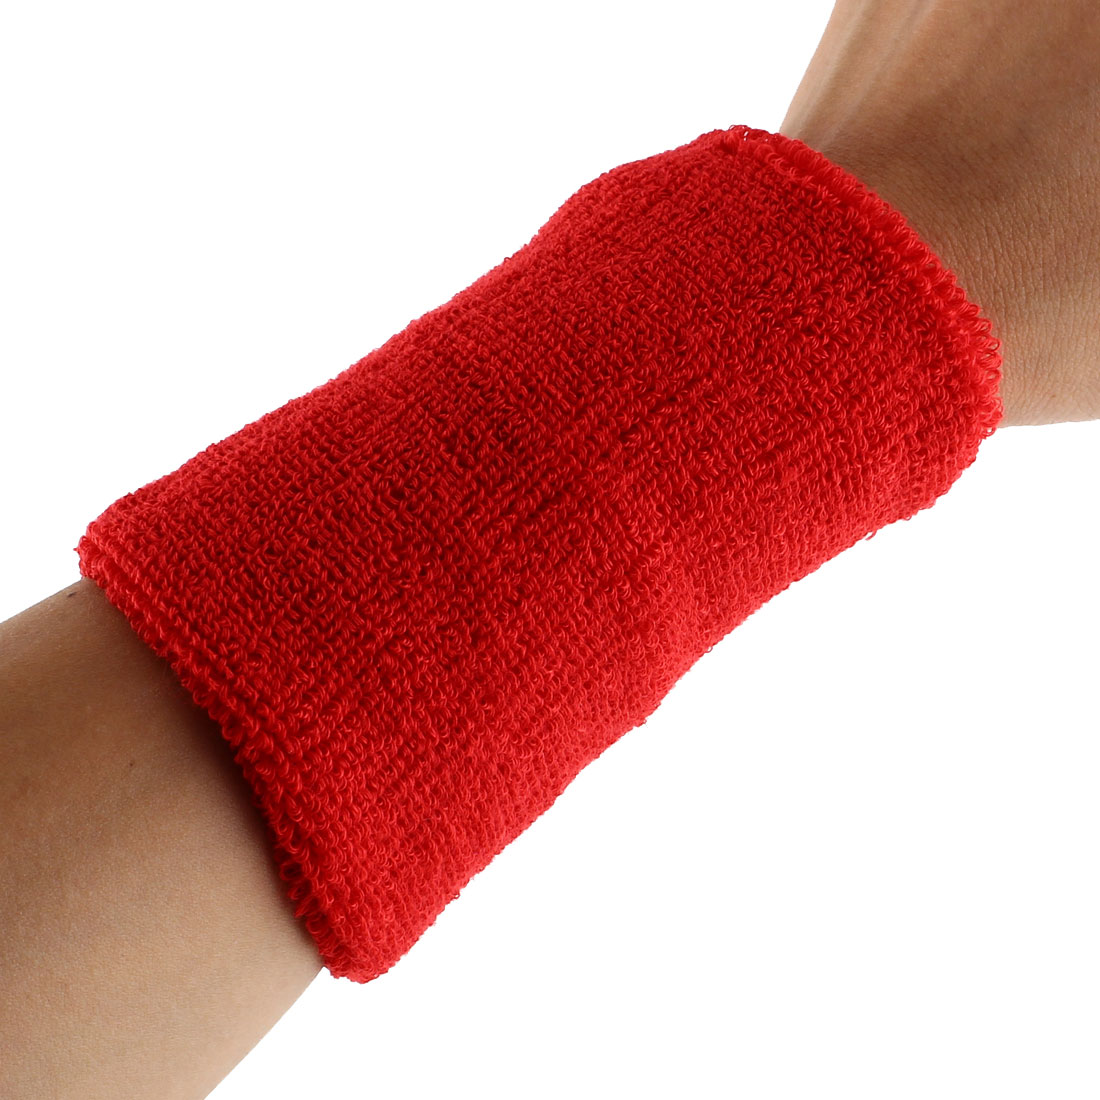 Exercises Football Gym Elastic Strap Hand Protector Sweatband Sport Wrist Red 2pcs